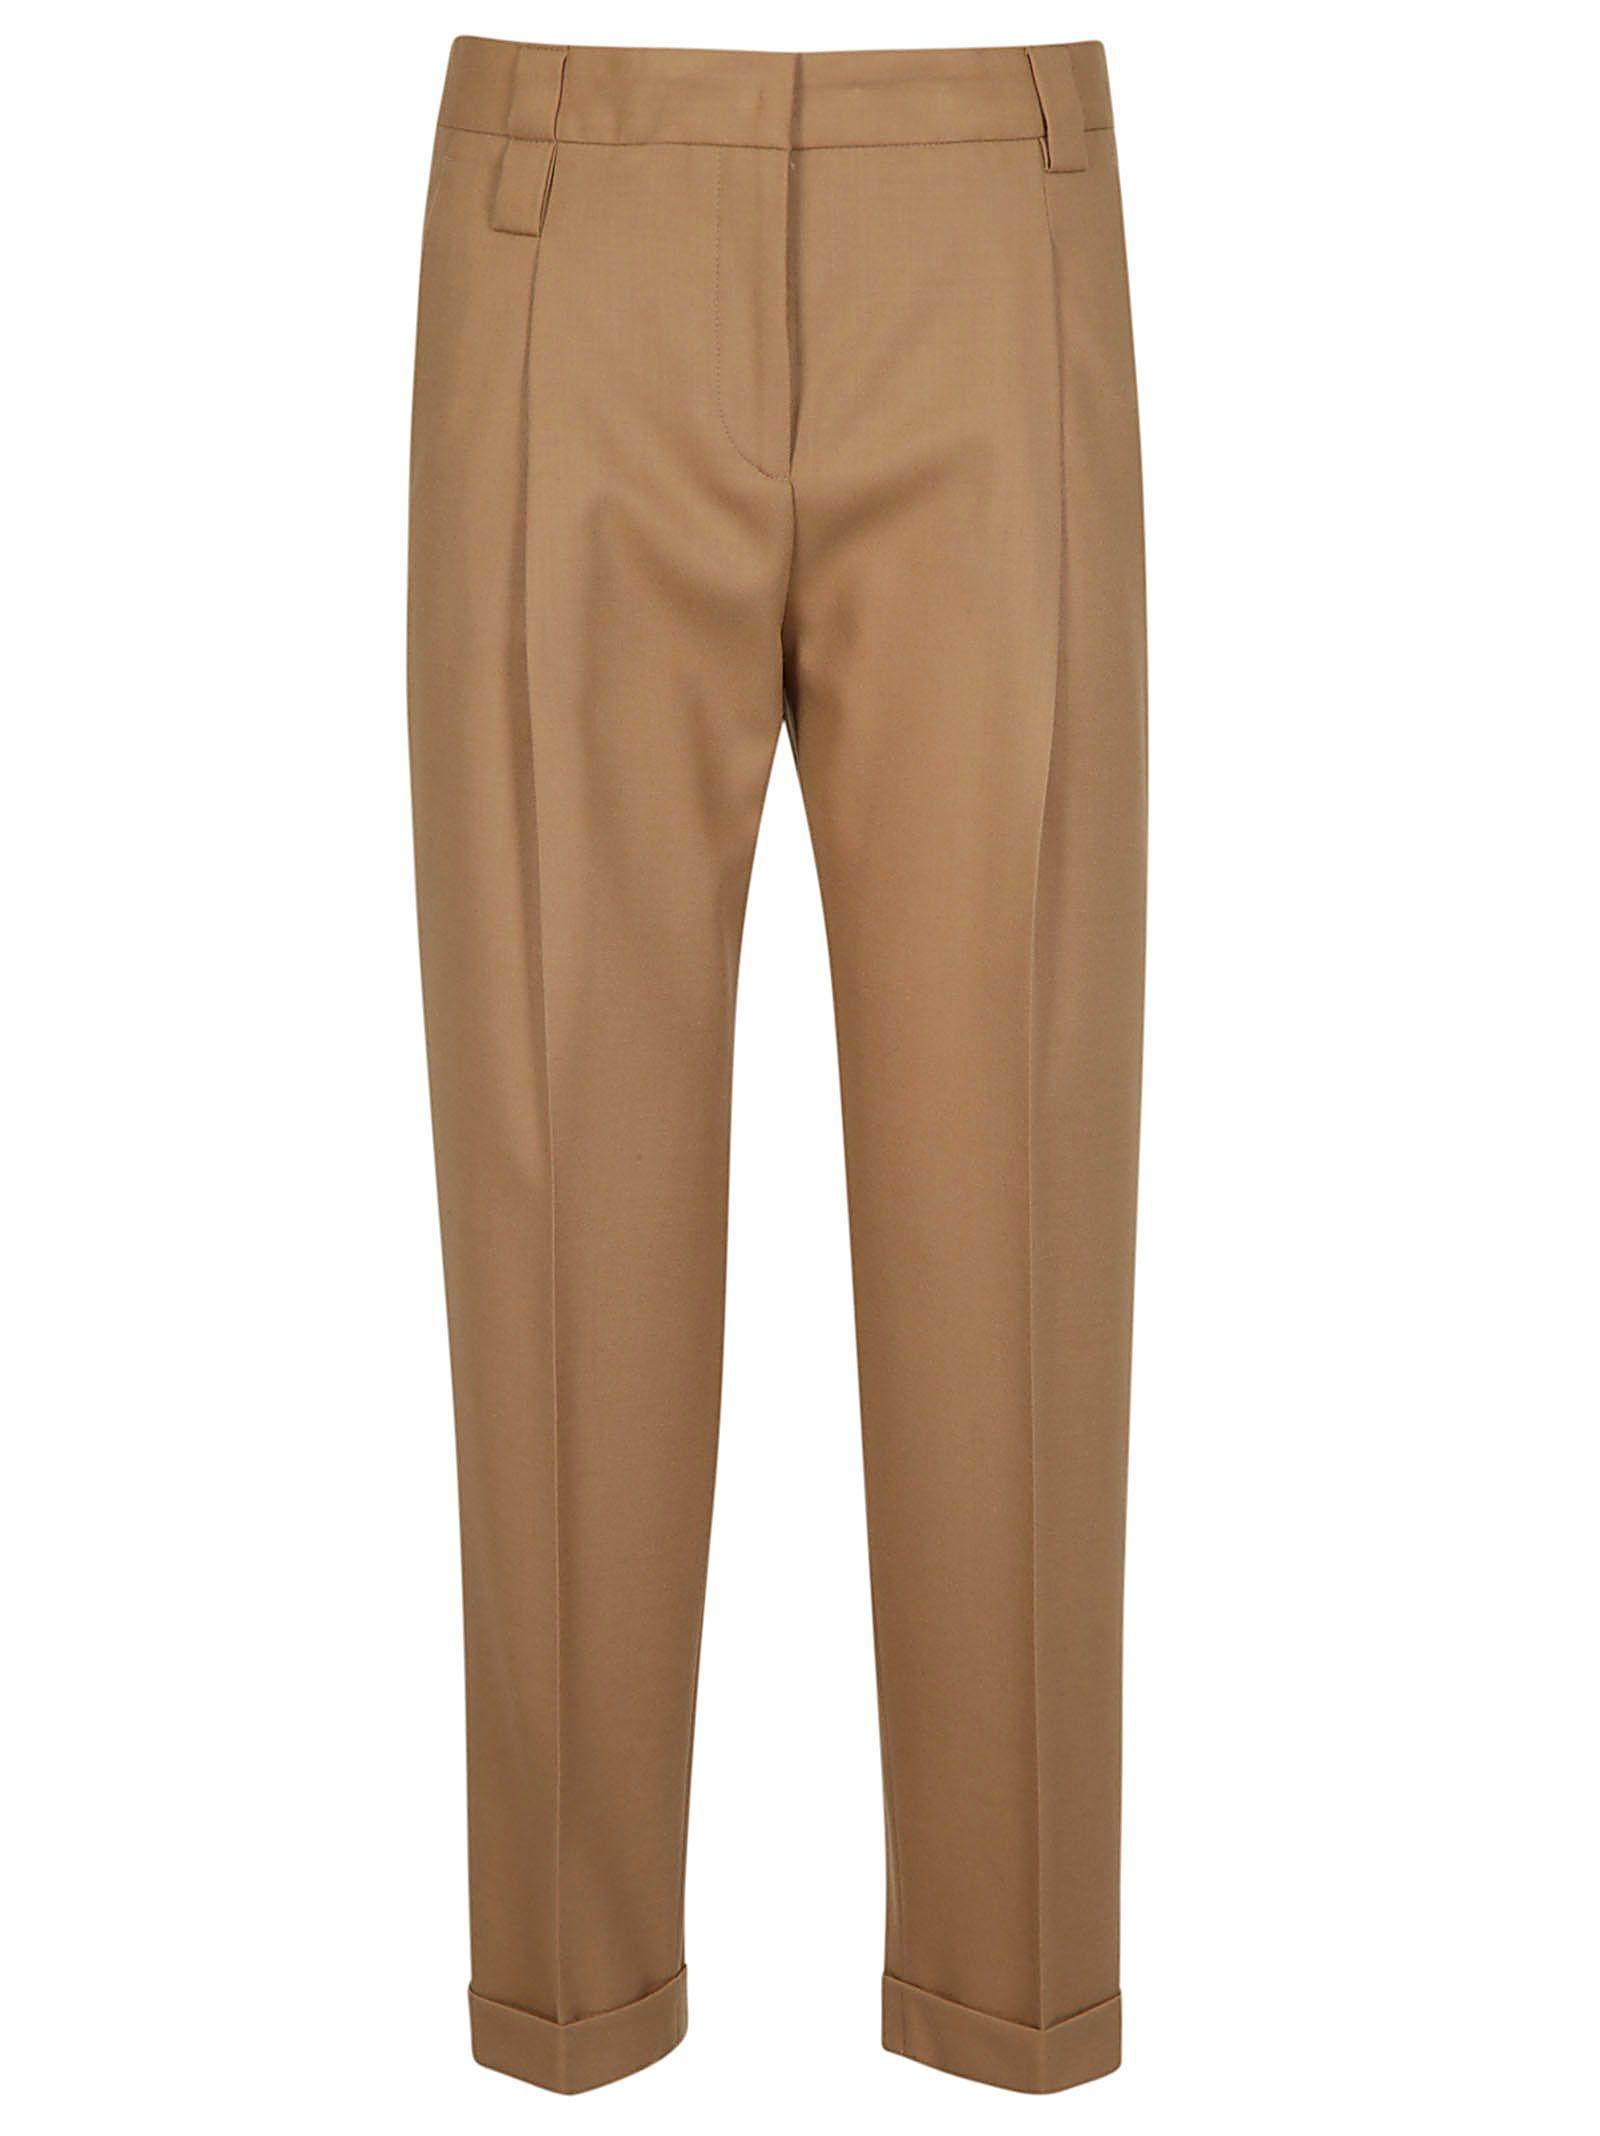 NEWYORKINDUSTRIE New York Industrie Straight Leg Trousers in Cammello